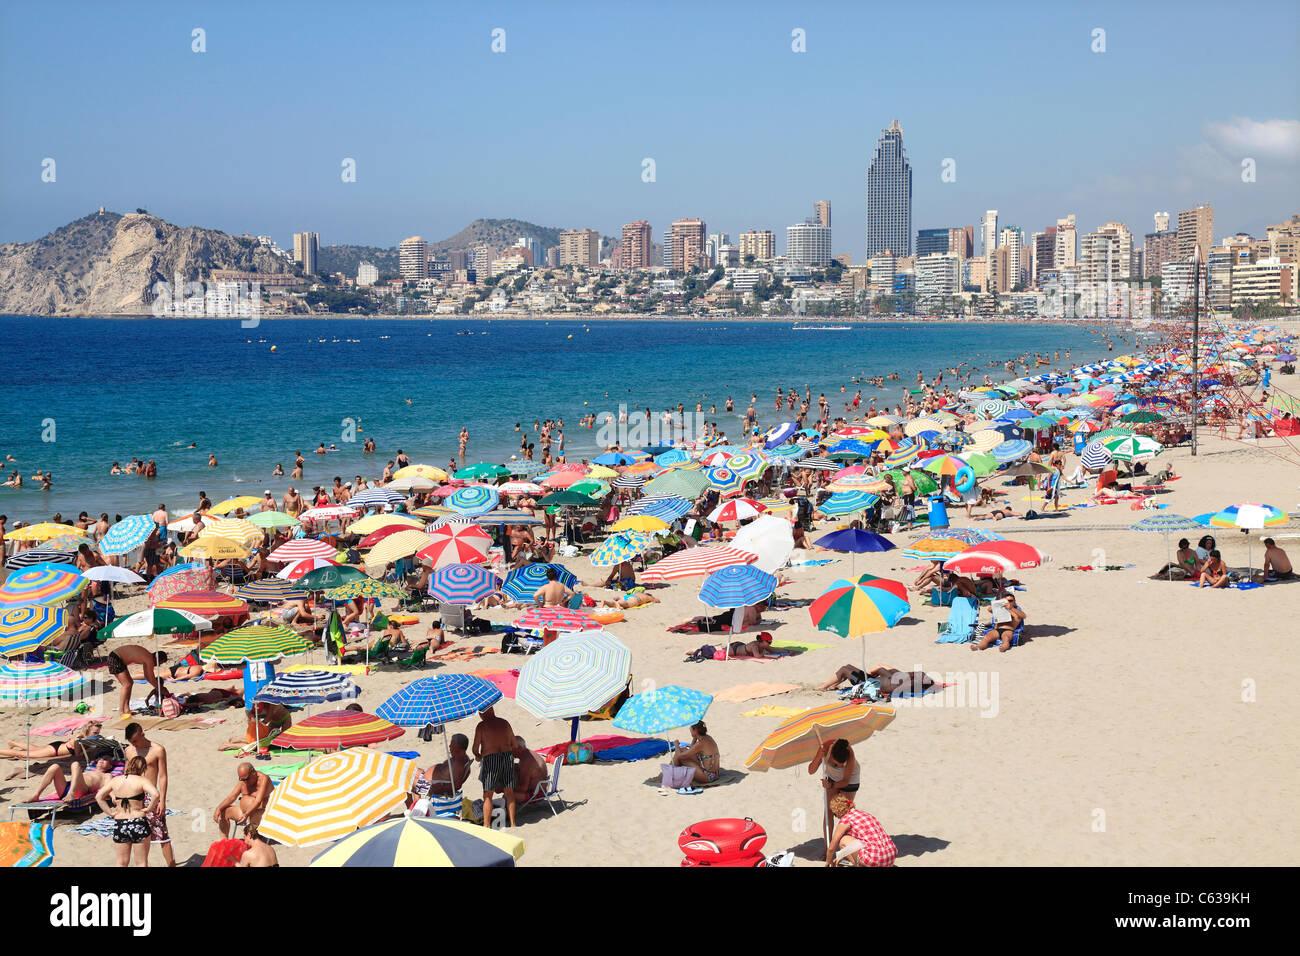 Beliebten Ferienort Benidorm in Spanien Stockbild